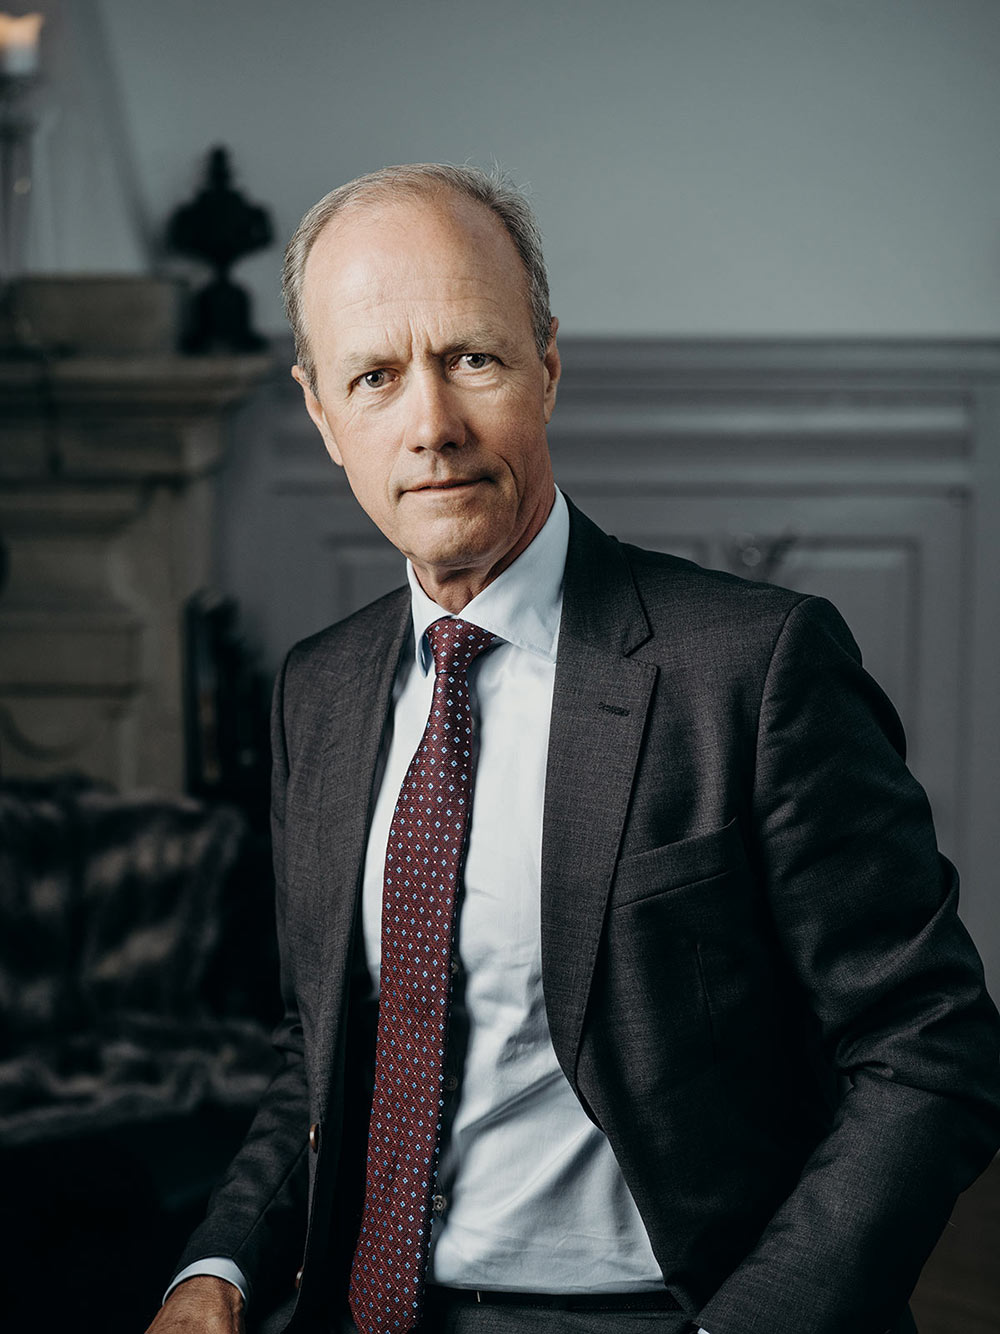 Lars Cronqvist